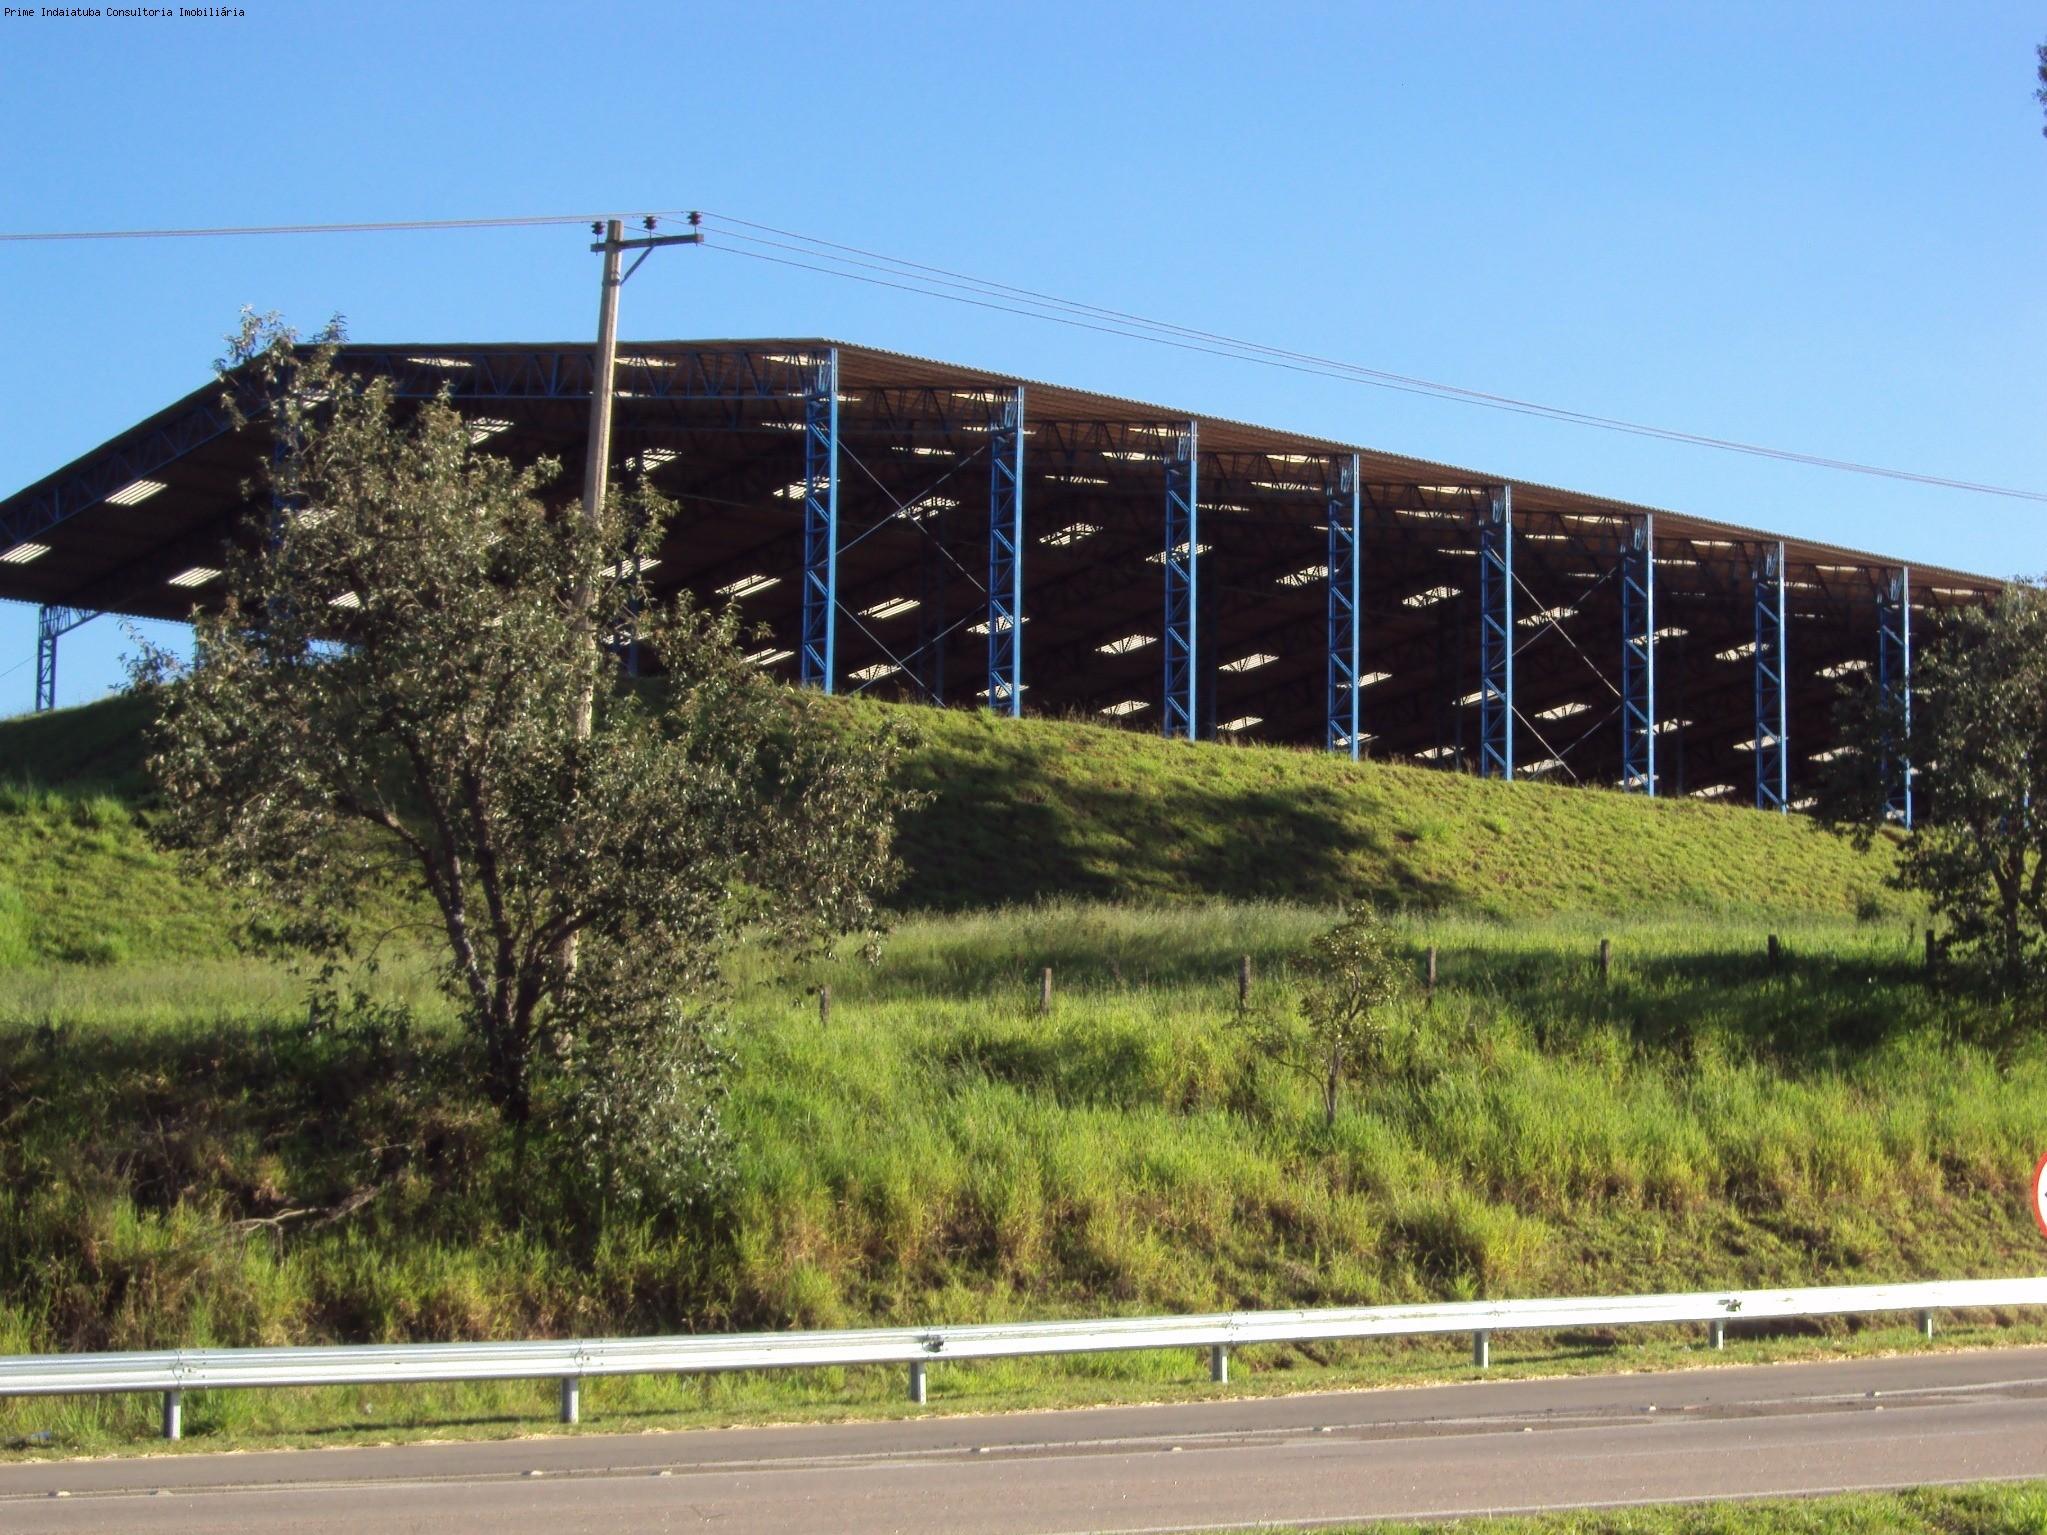 comprar ou alugar area no bairro 72.000m² industrial rodovia marechal rondon na cidade de porto feliz-sp